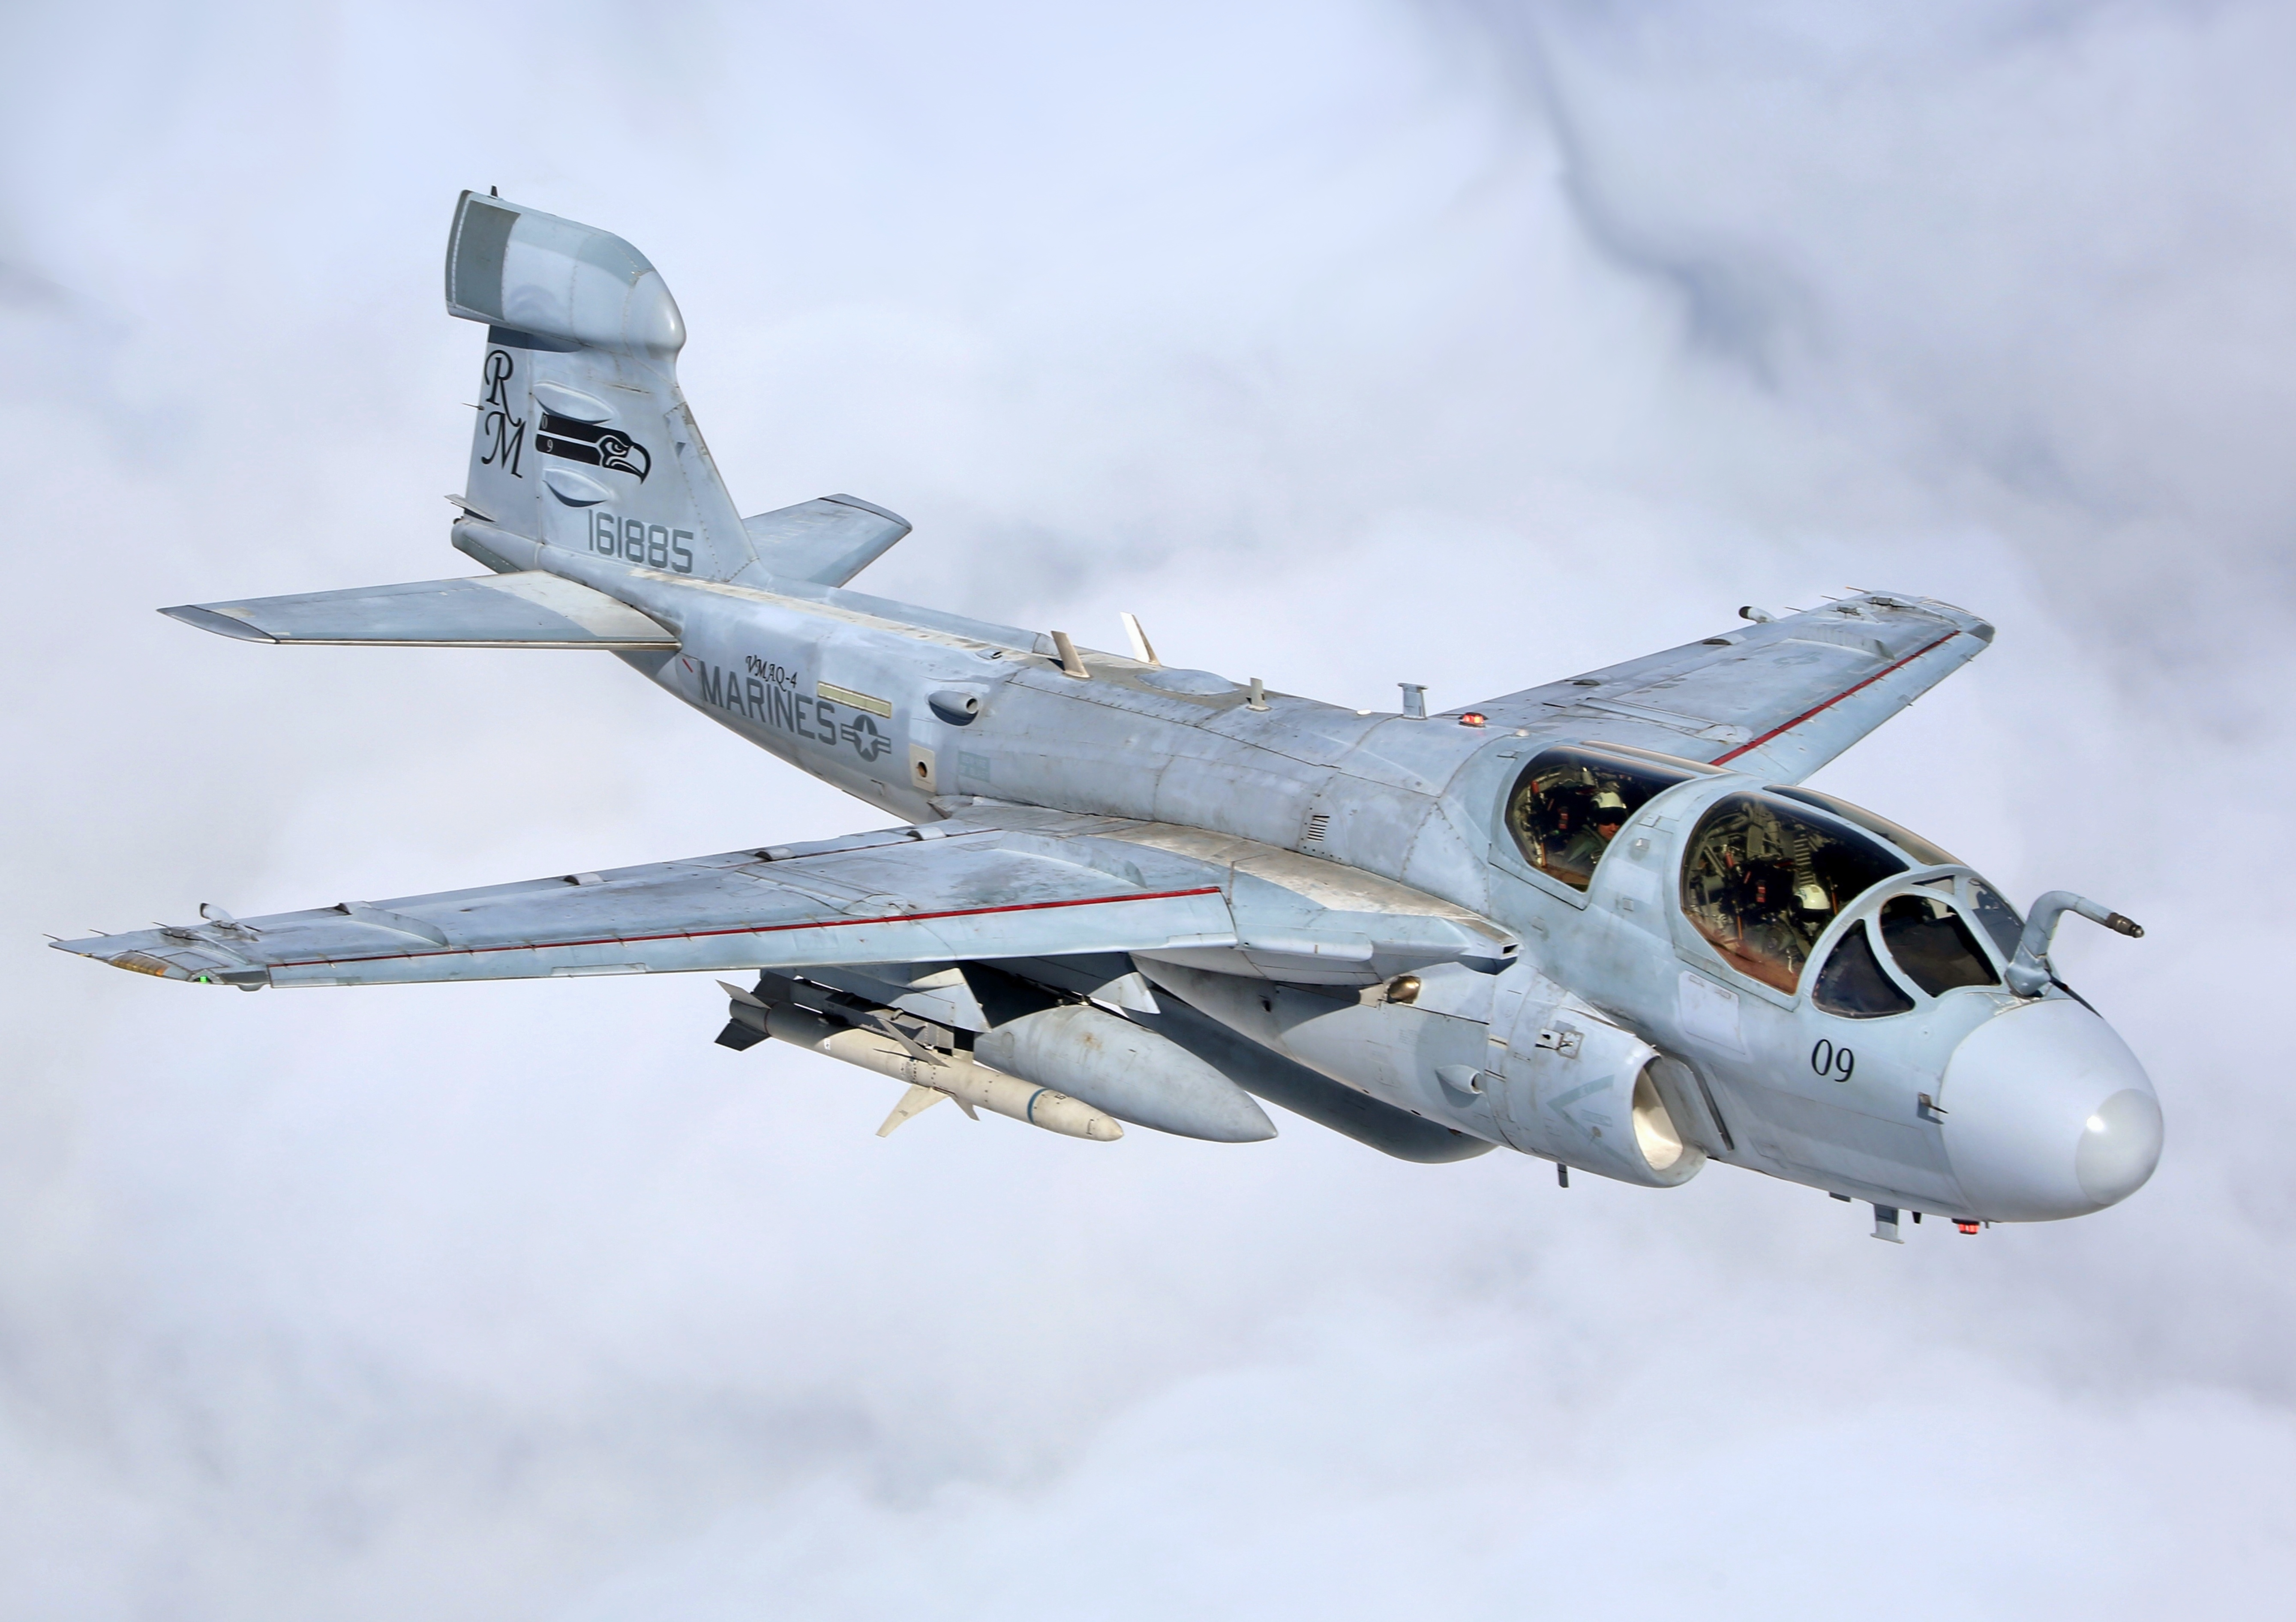 Northrop Grumman EA-6B Prowler - Wikipedia